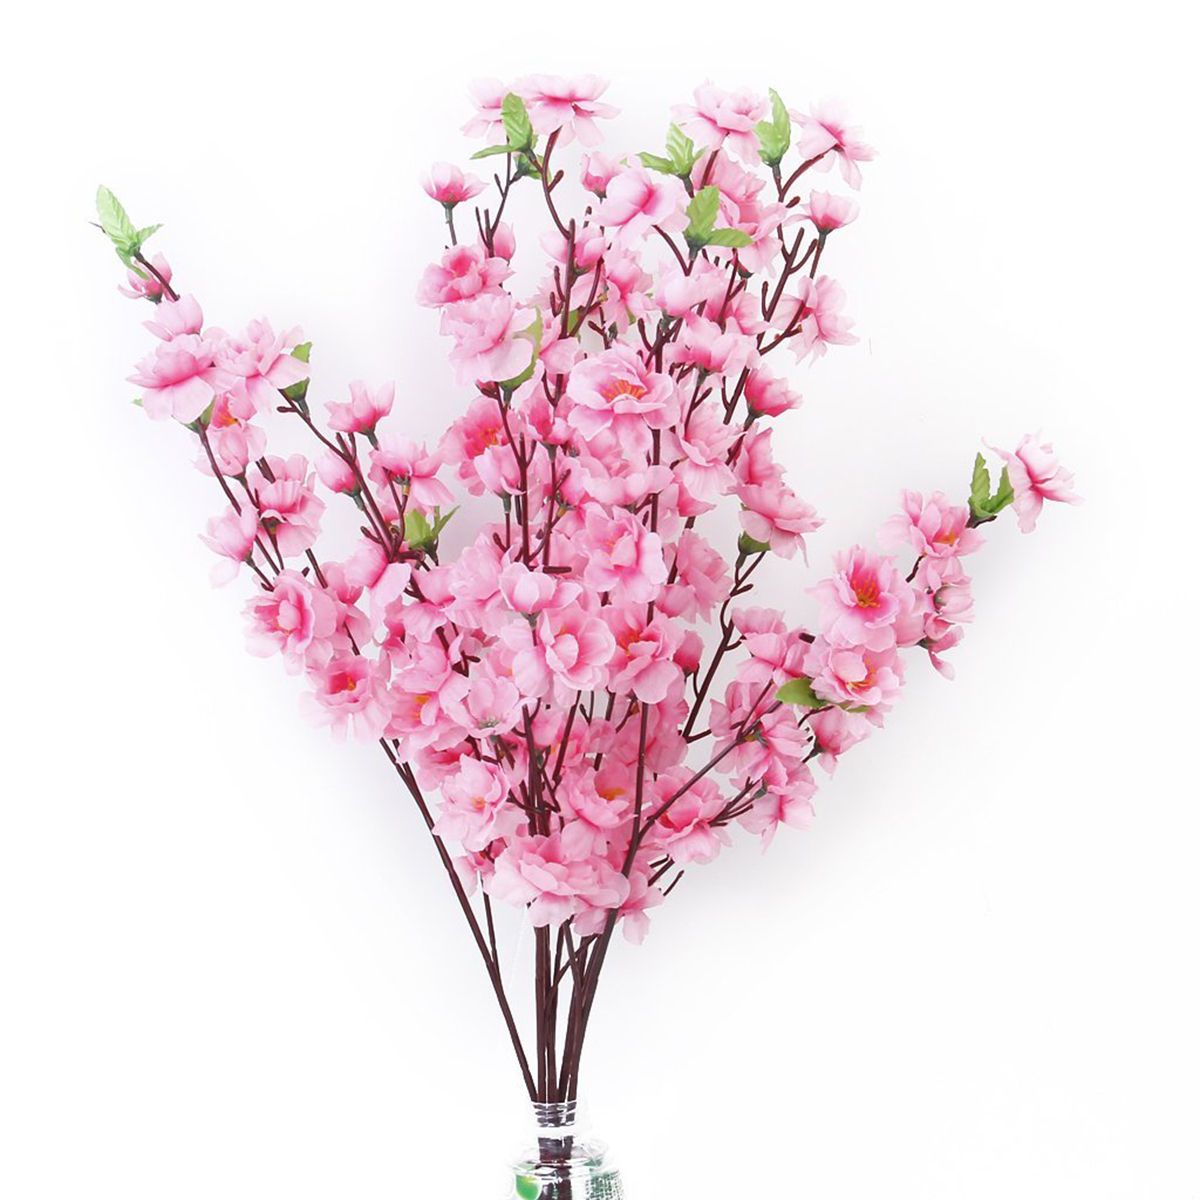 6st persika blomma simulering blommor konstgjorda blommor siden - Semester och fester - Foto 2